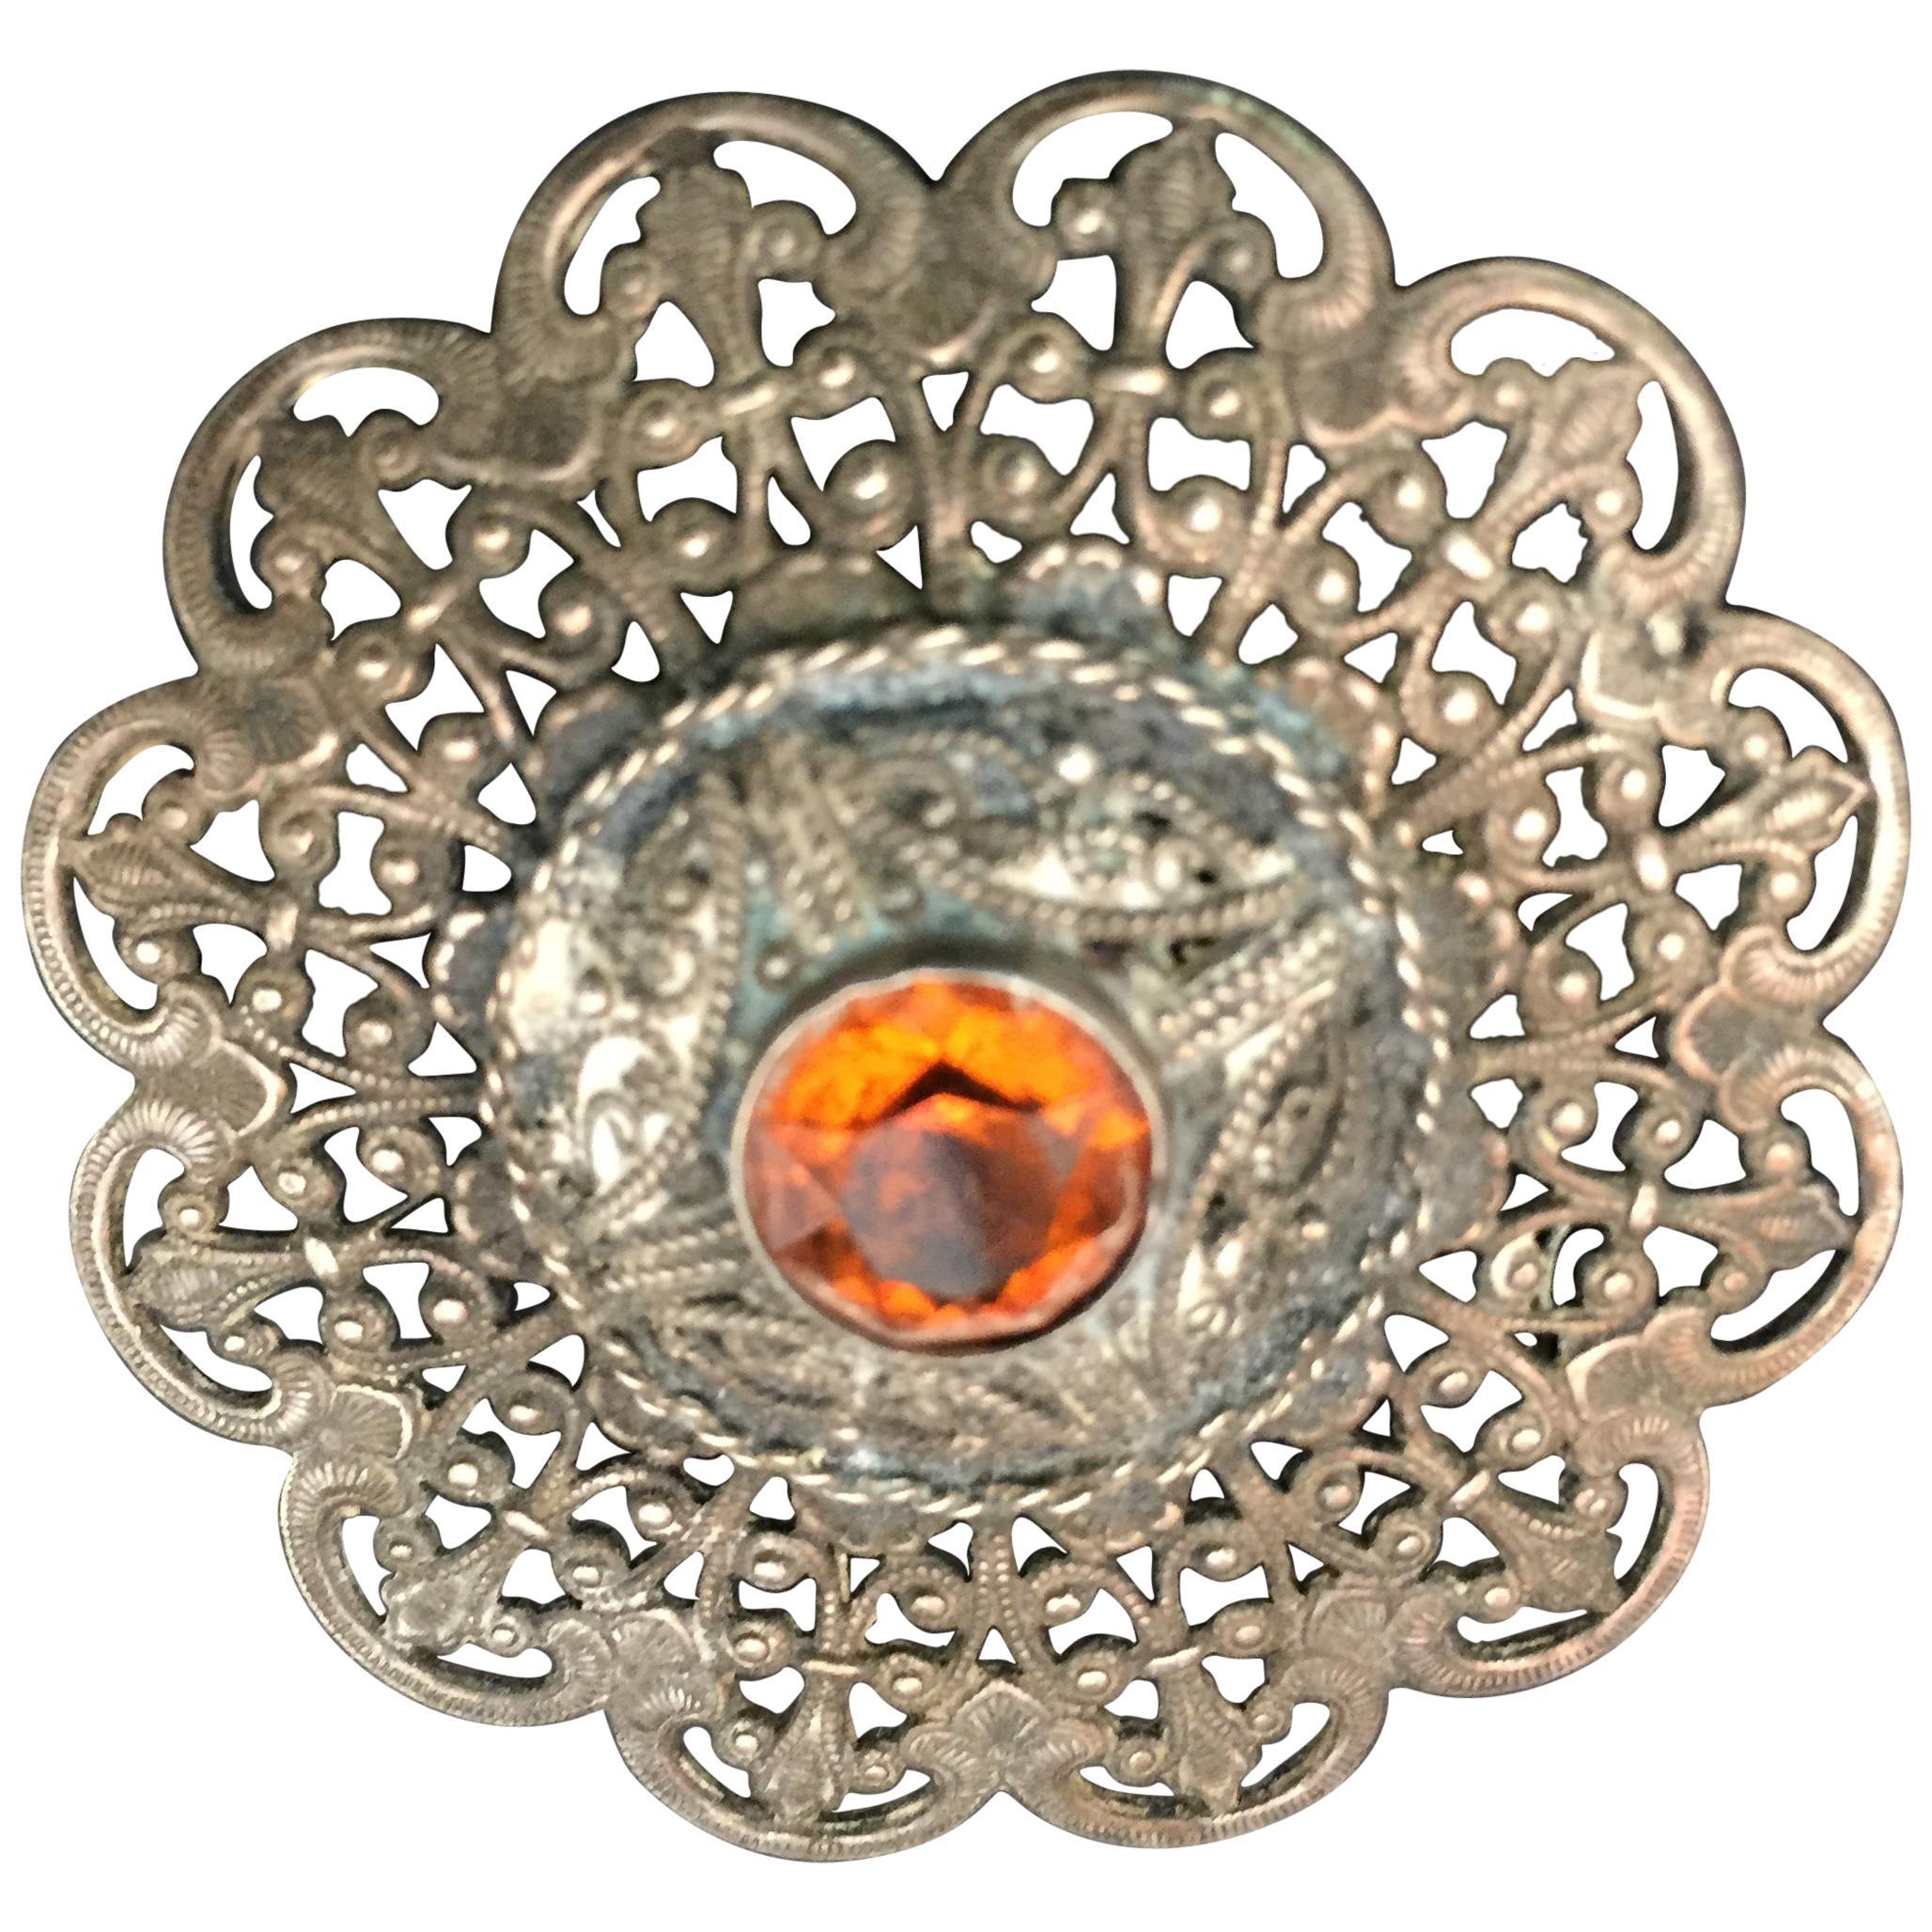 Ottoman Style Turkish Silver Brooch or Veil Pin with Moorish Filigree